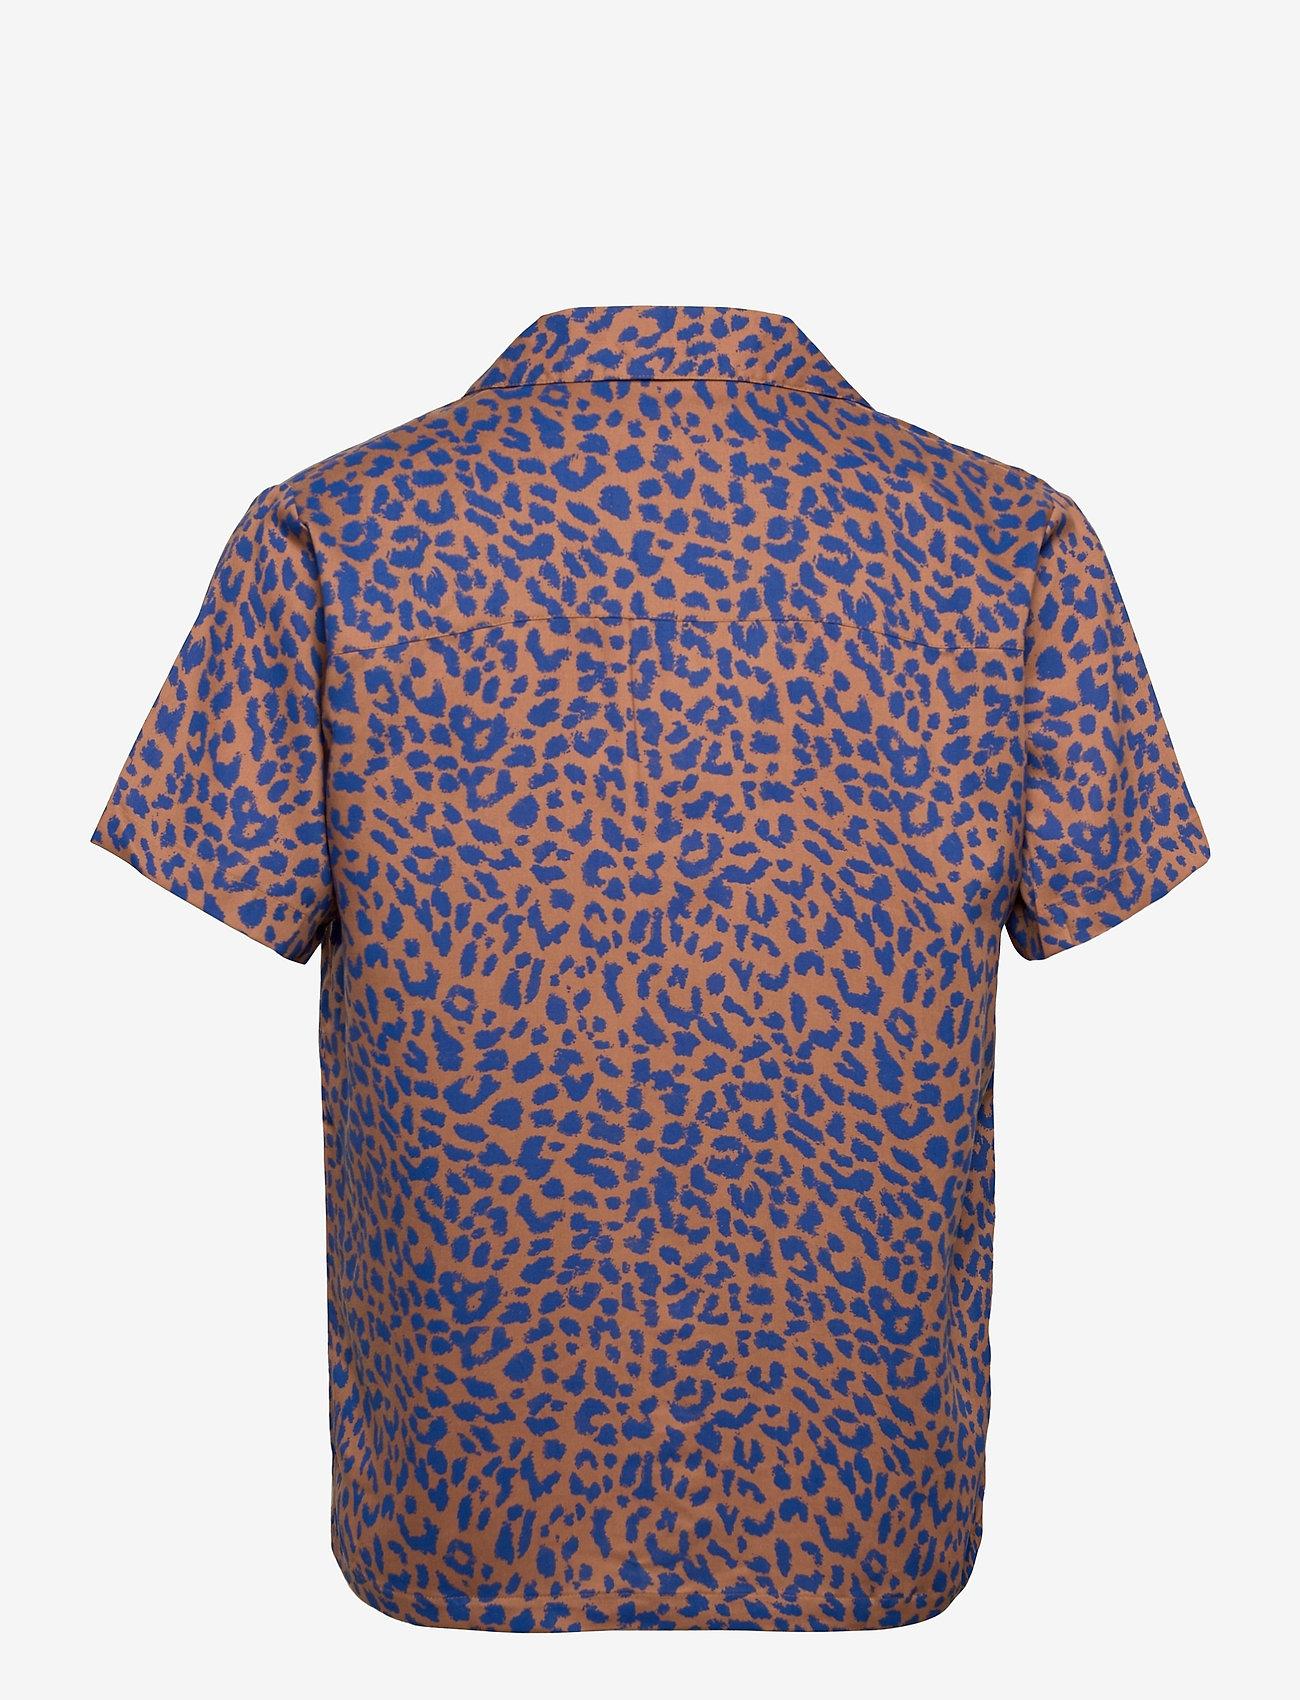 DEDICATED - Shirt Short Sleeve Marstrand Leopard Light Brown - geruite overhemden - chipmunk - 1